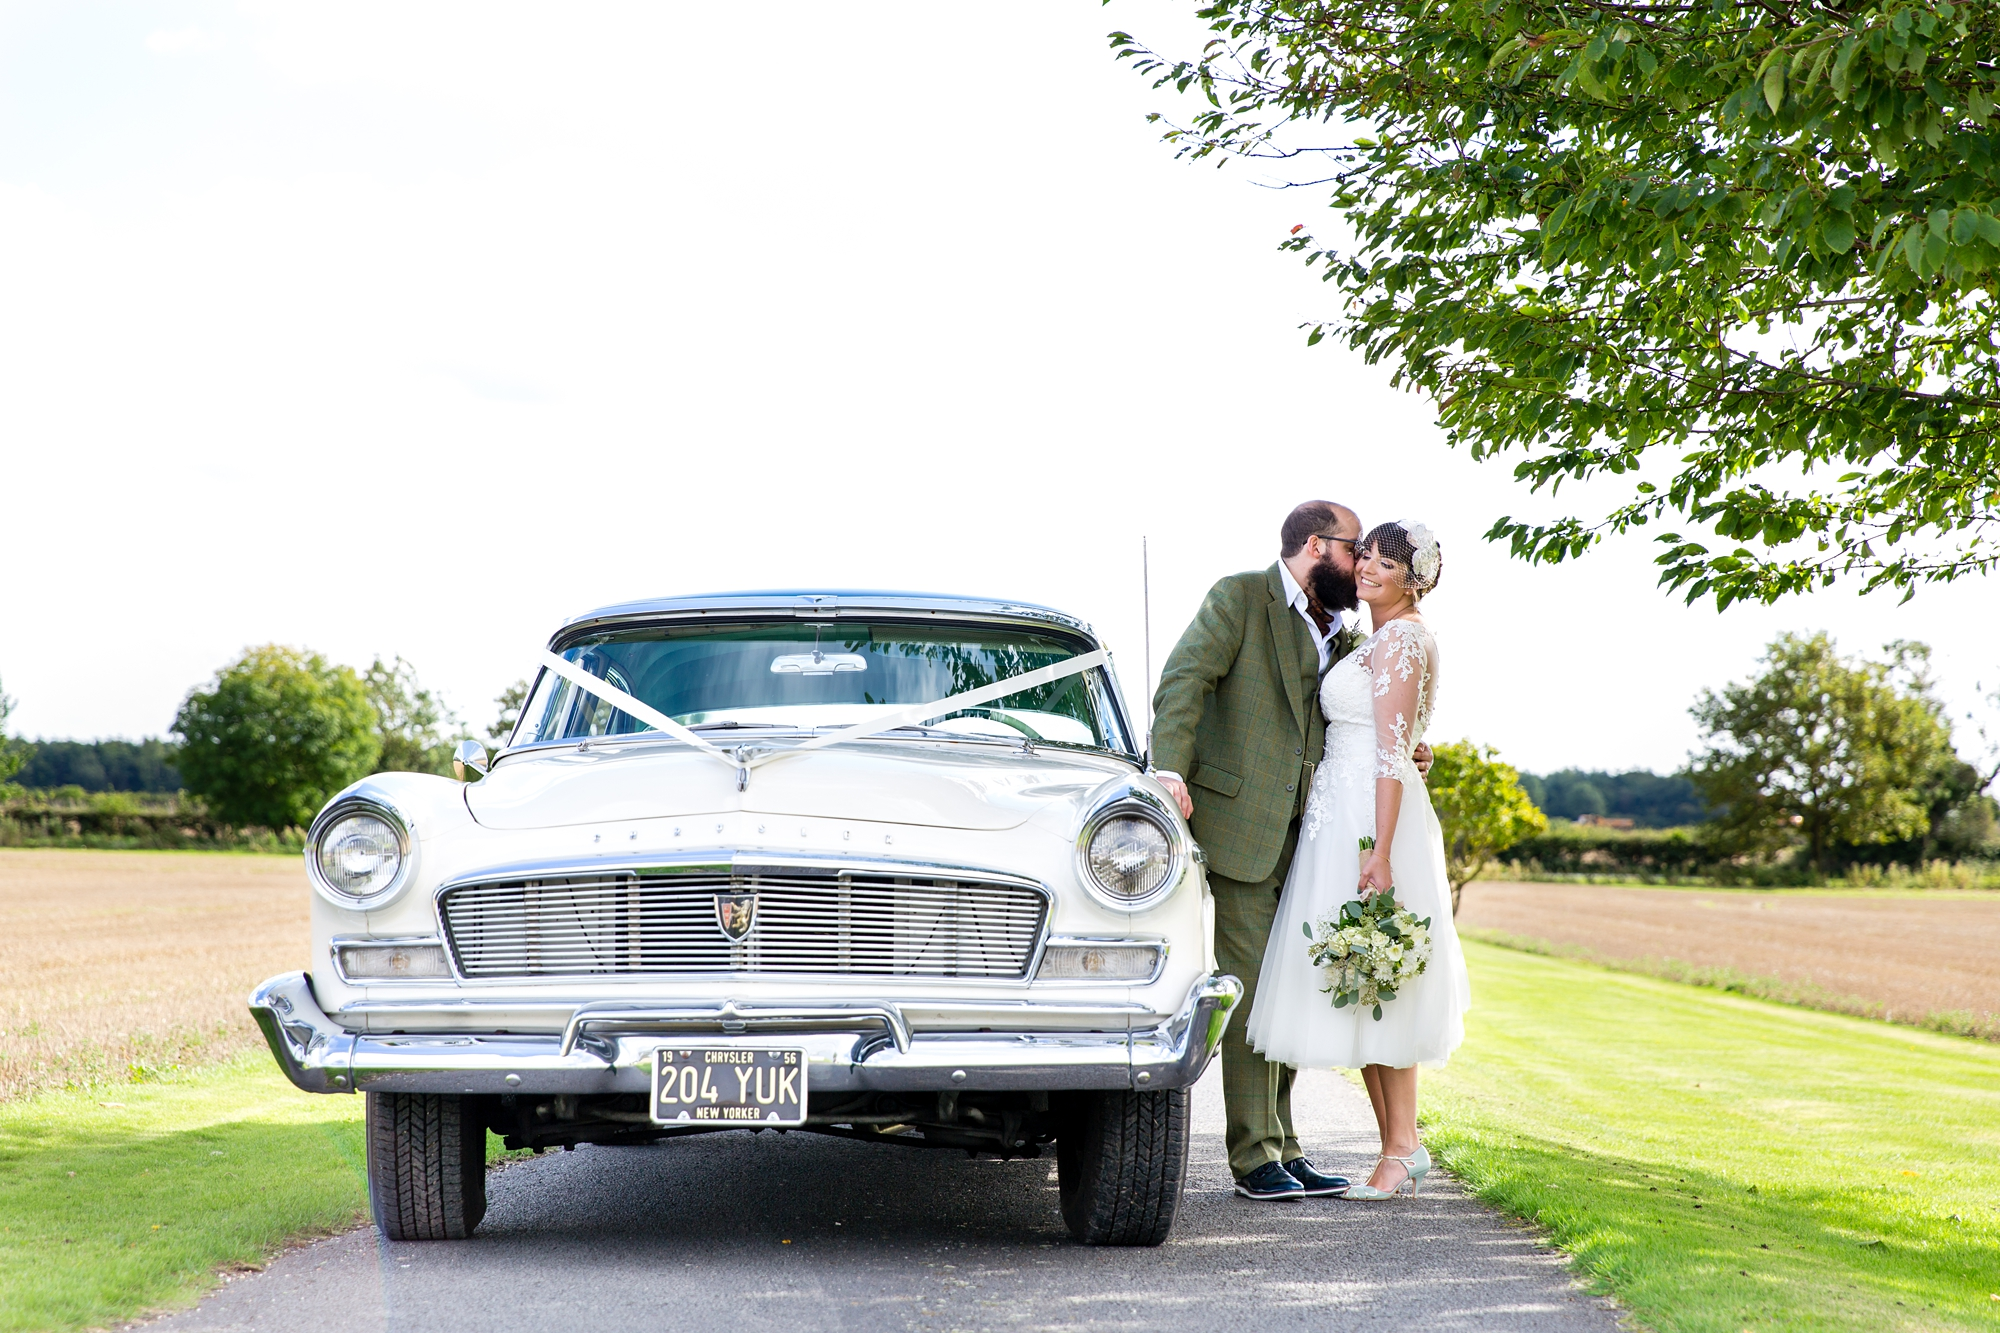 York Wedding Photography at Barmbyfield Barns